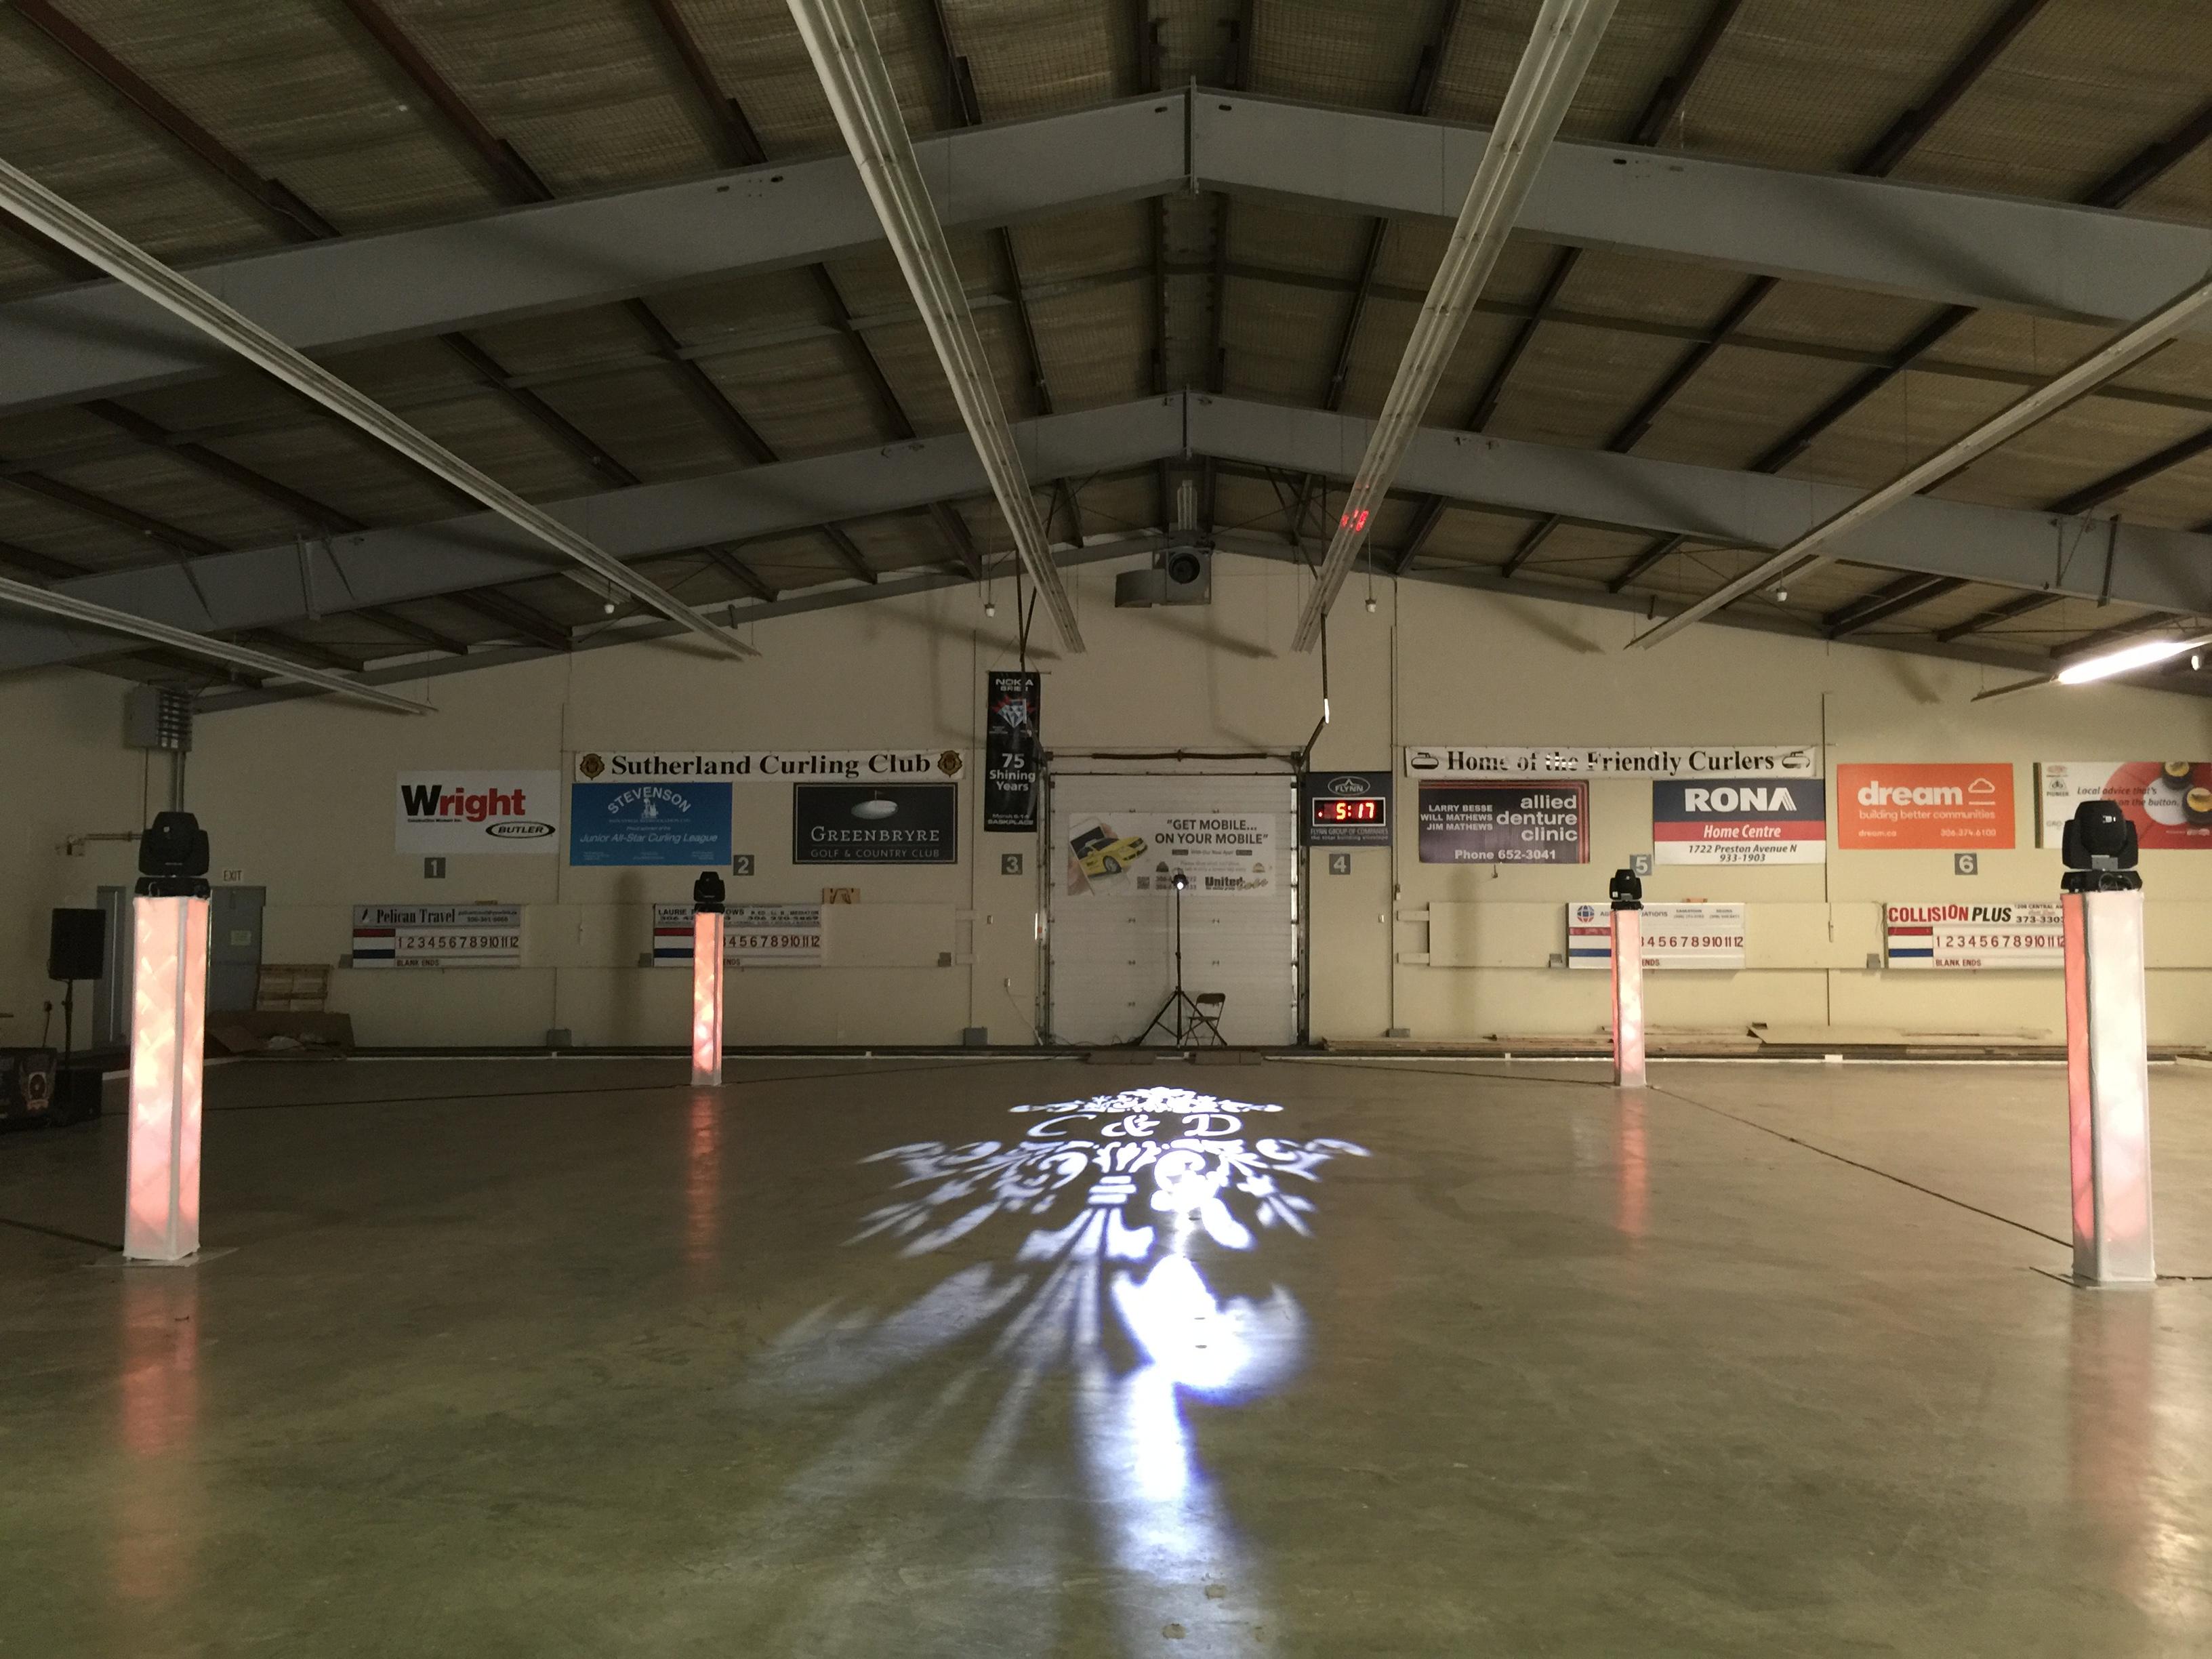 Sutherland Curling Club